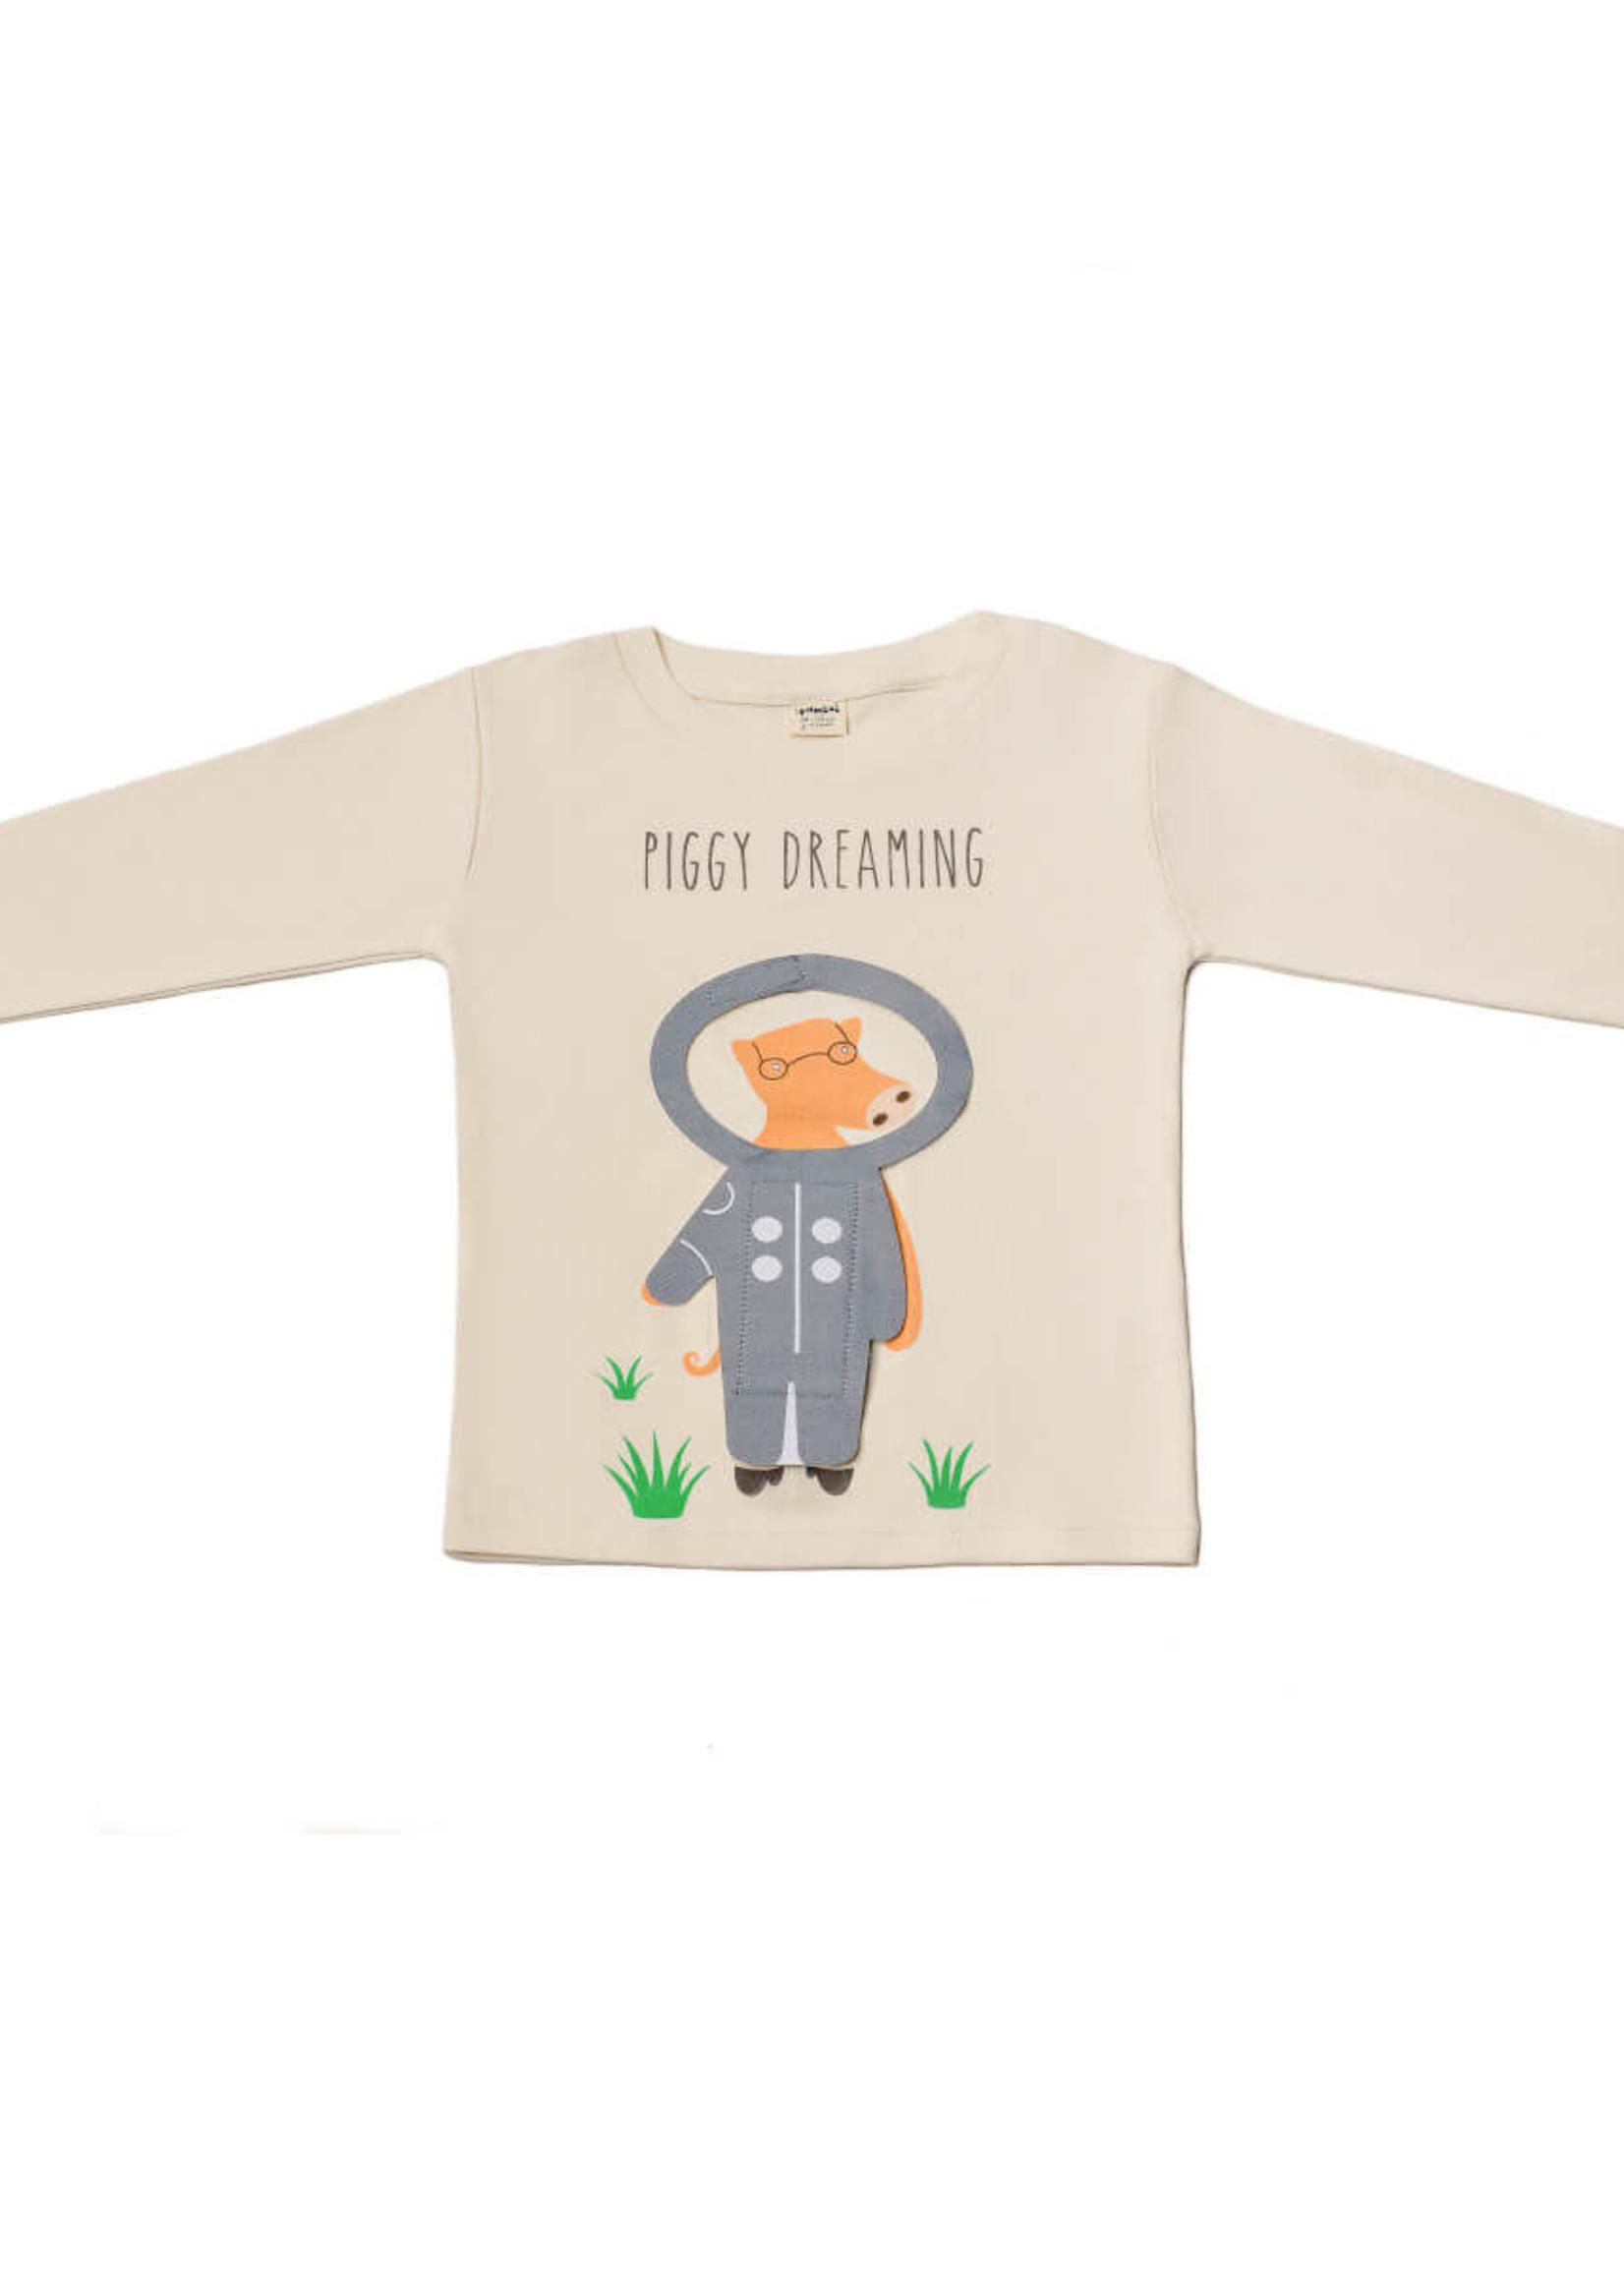 Pamboo Pamboo-ss21 Piggy dreaming  shirt